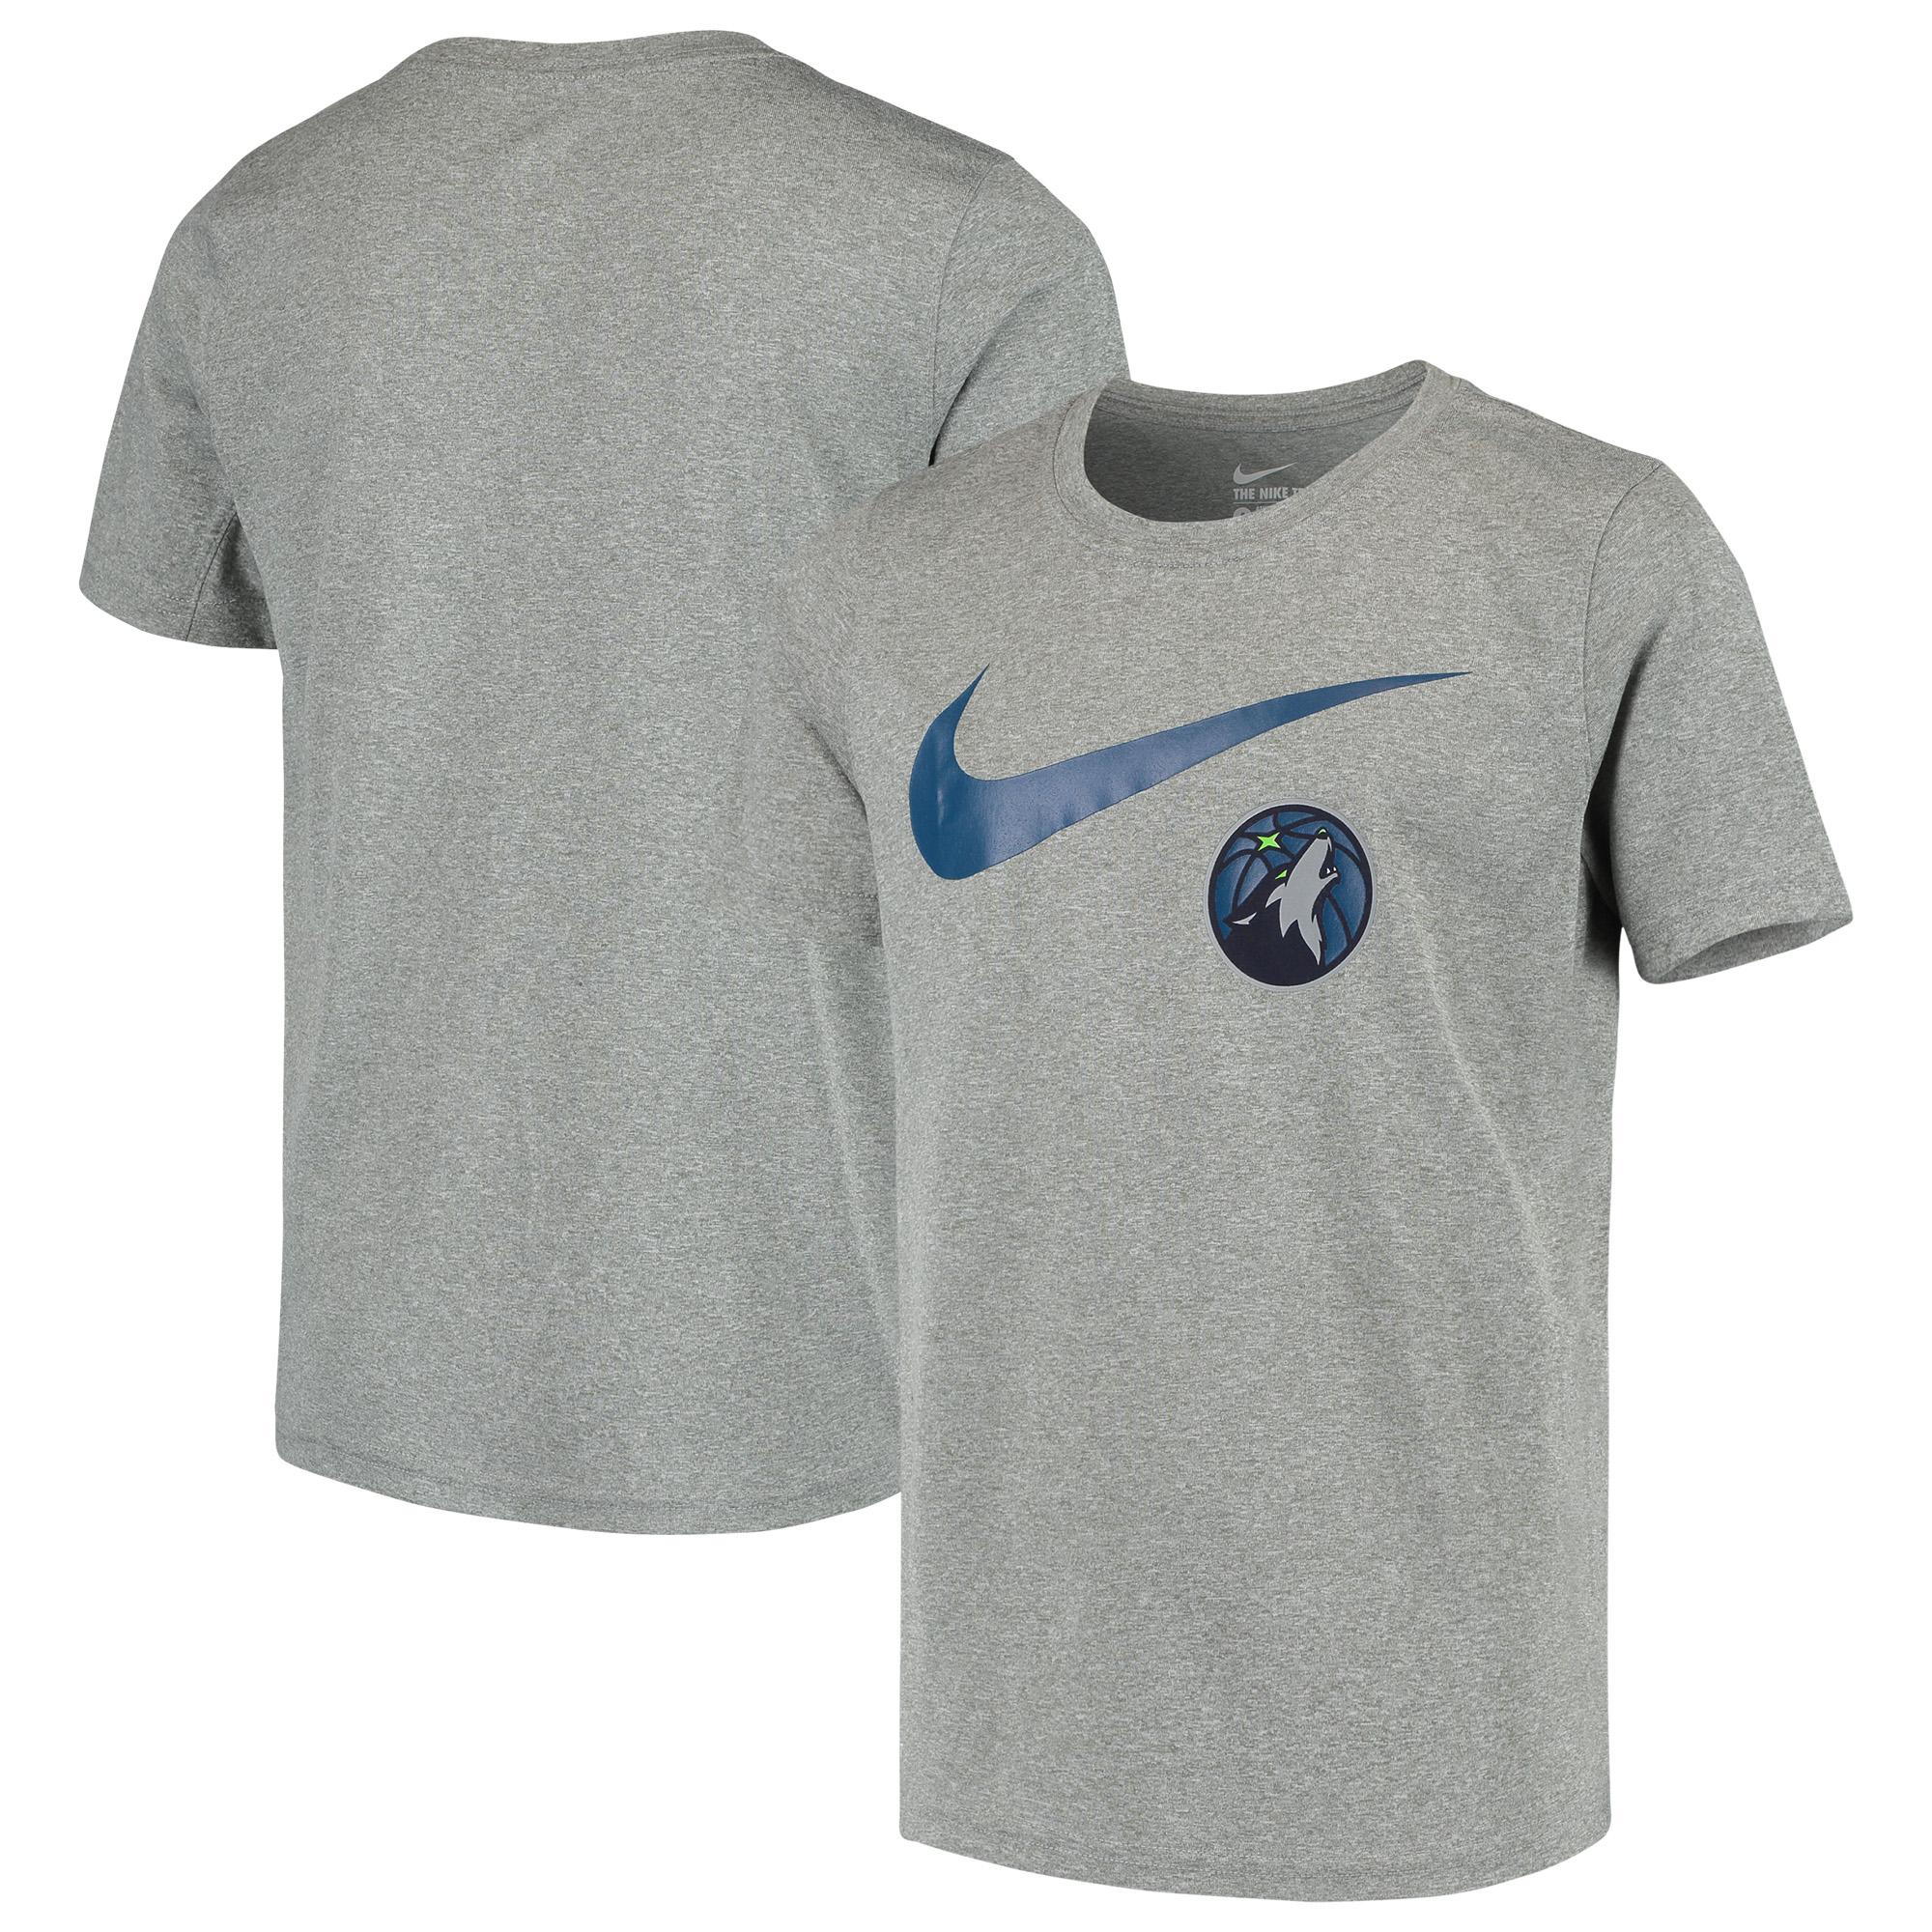 Minnesota Timberwolves Nike Swoosh Logo Legend T-Shirt - Heathered Gray